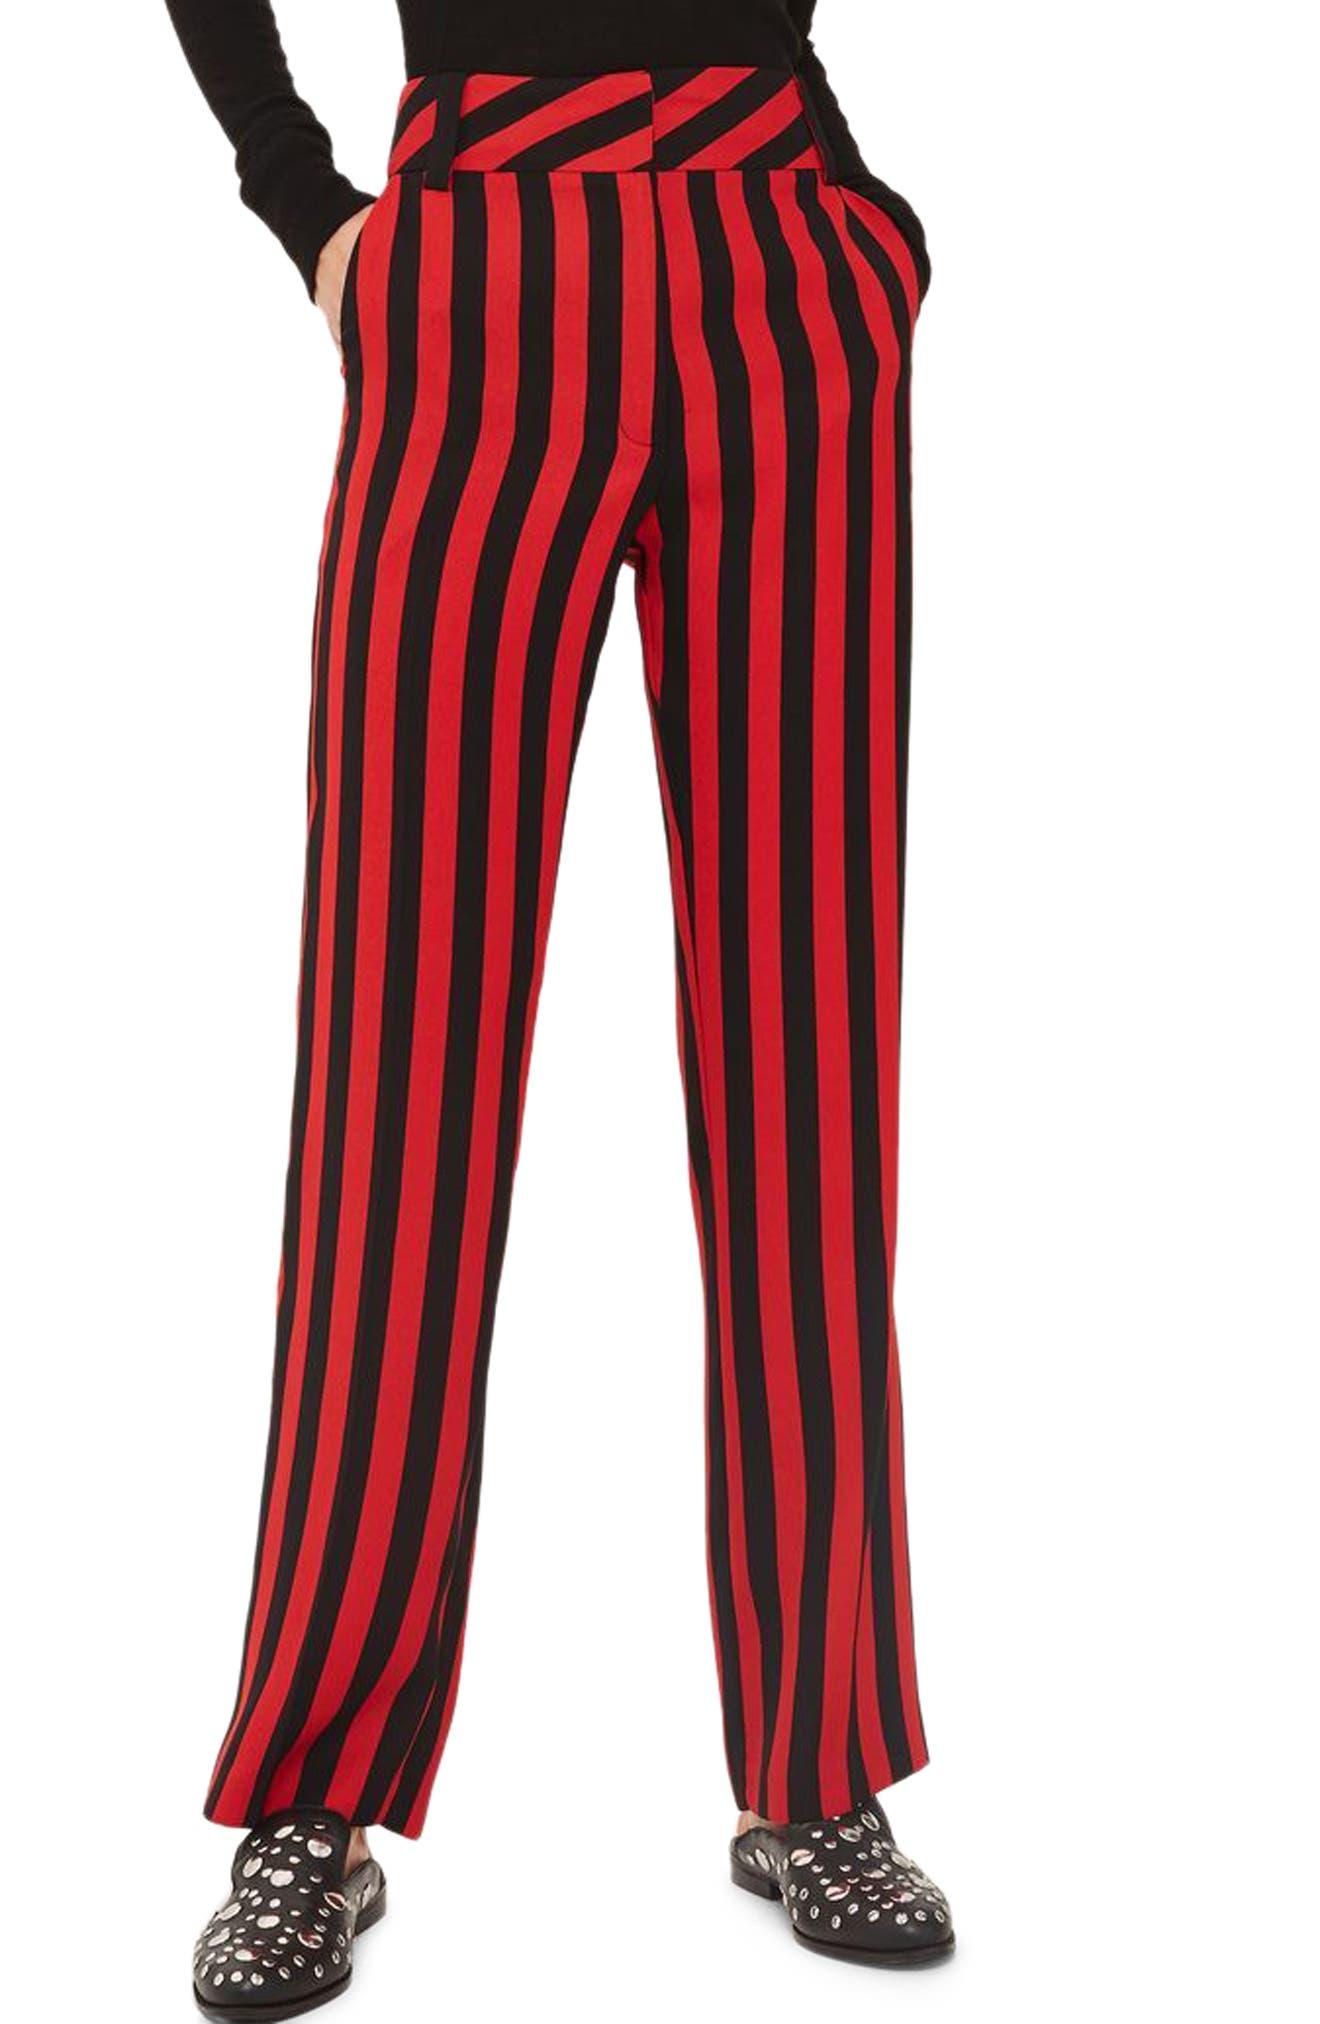 Topshop Humbug Stripe Trousers